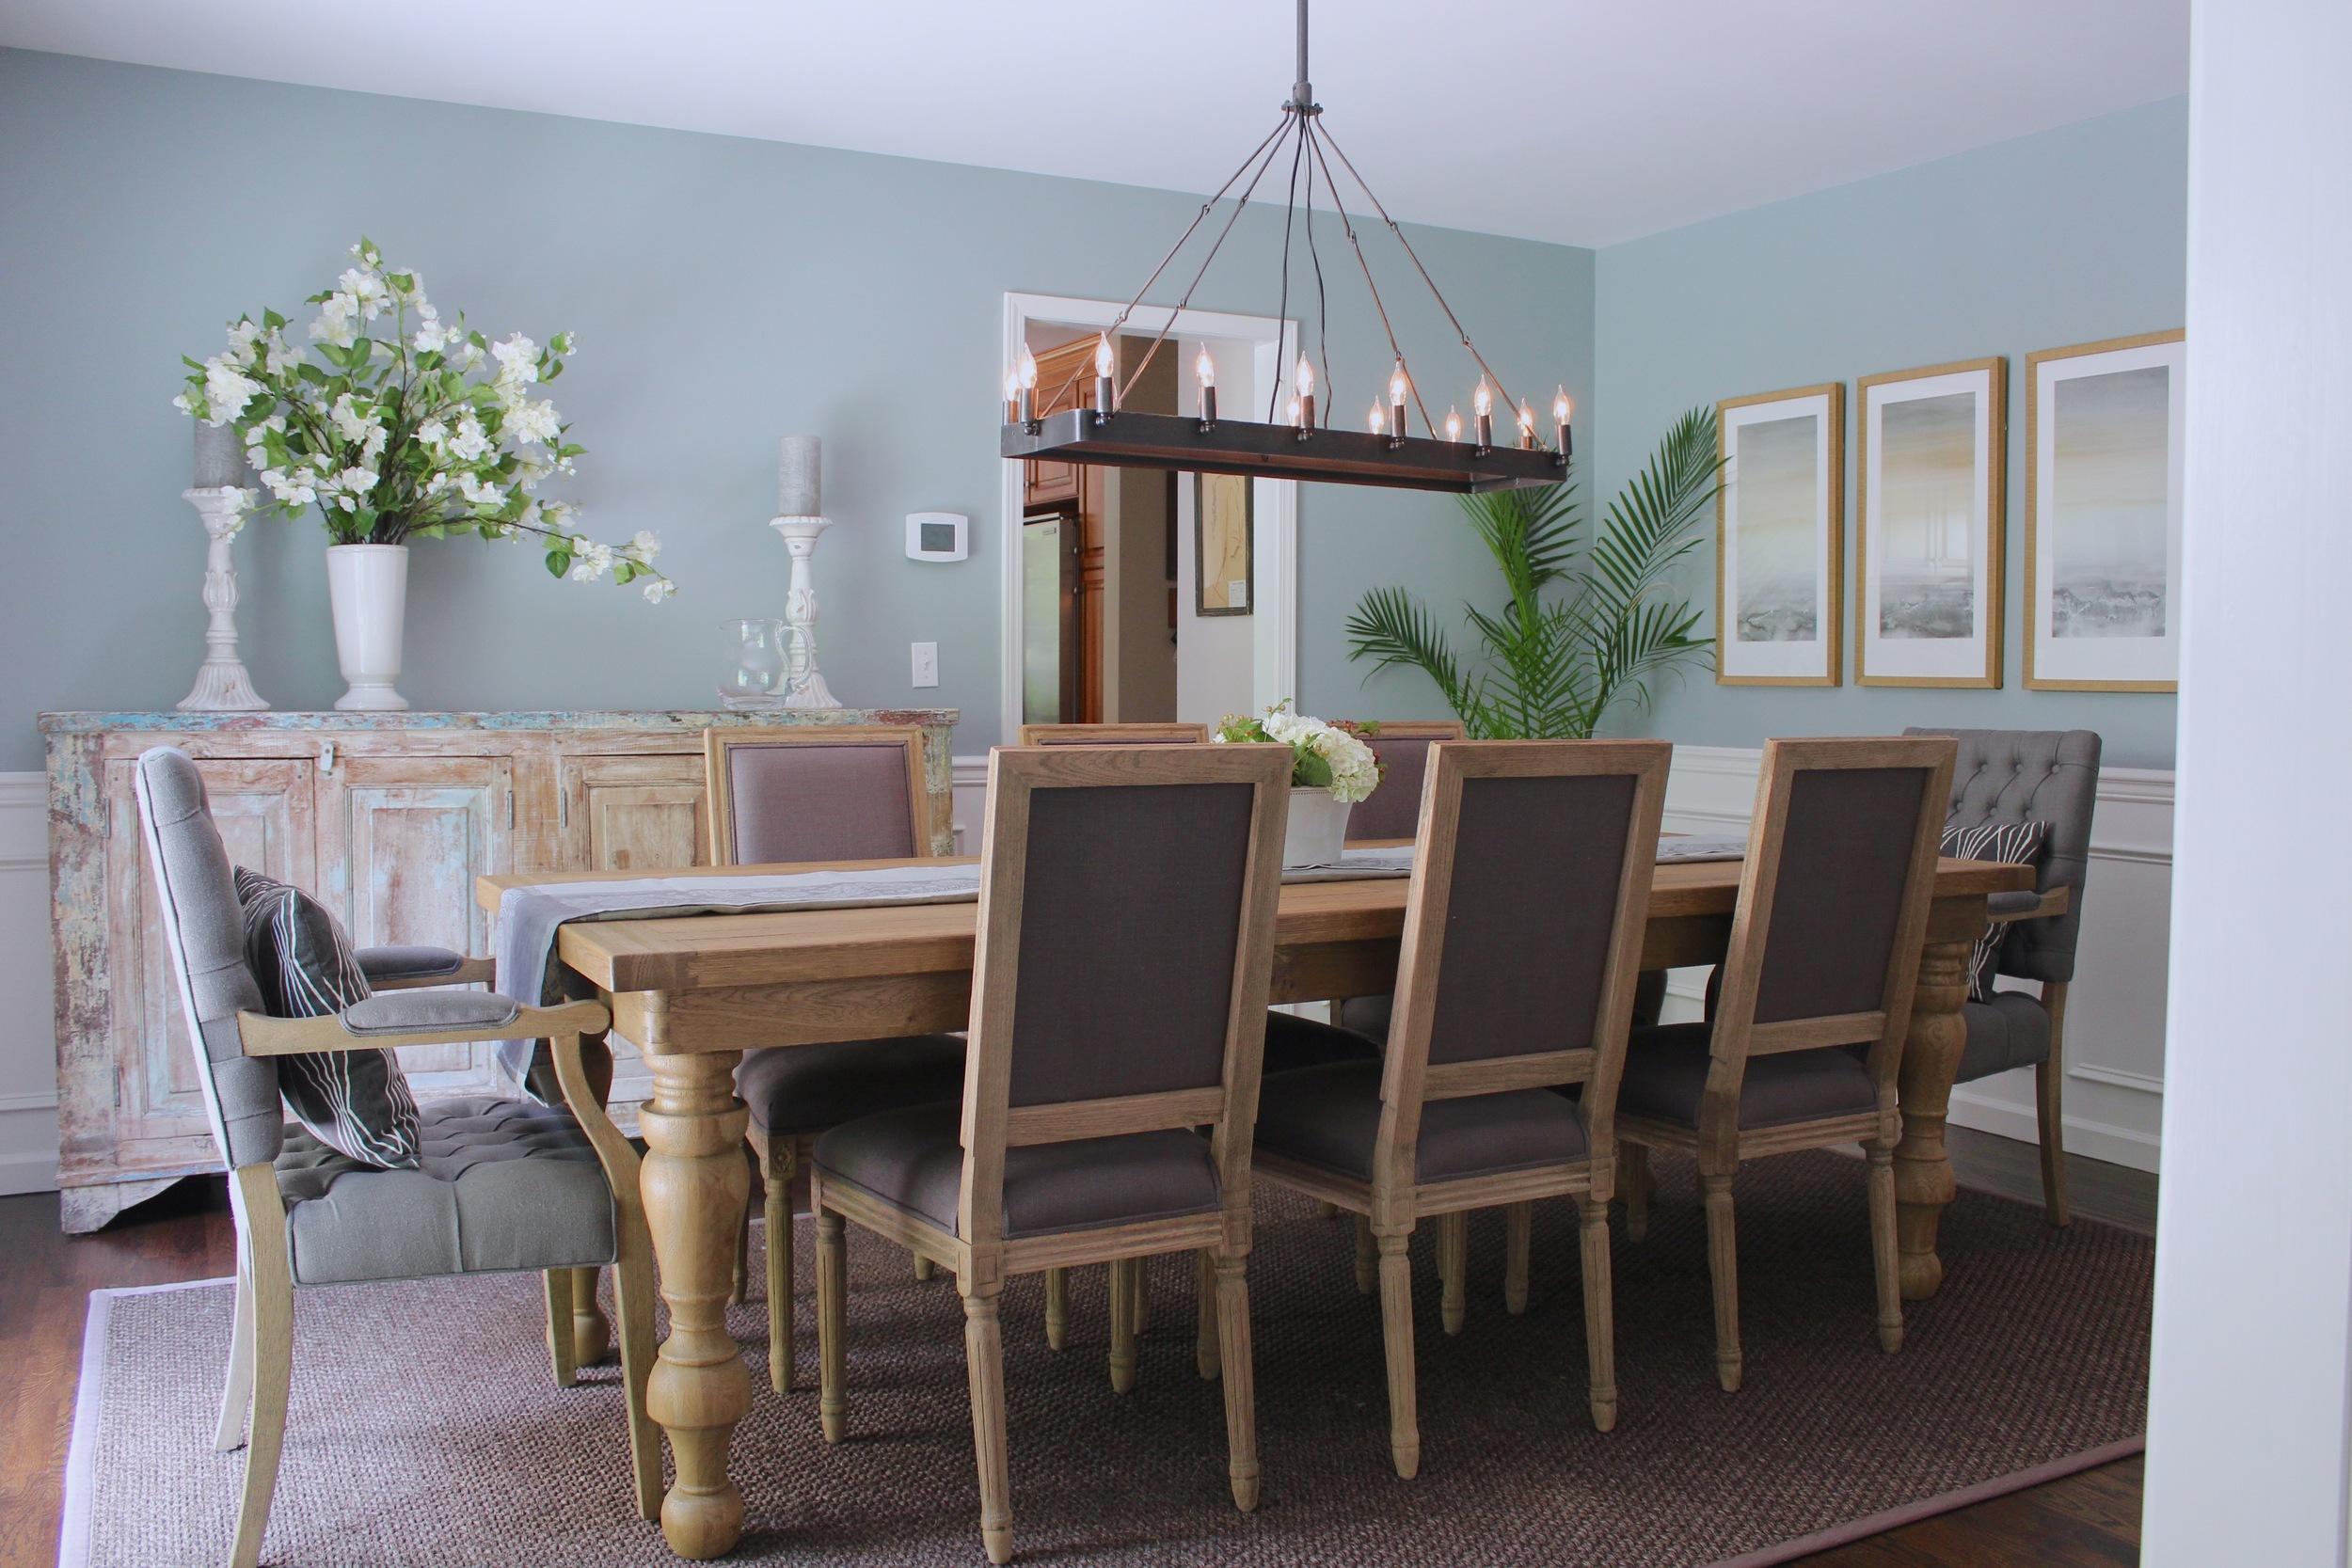 DINING ROOM, Danbury CT